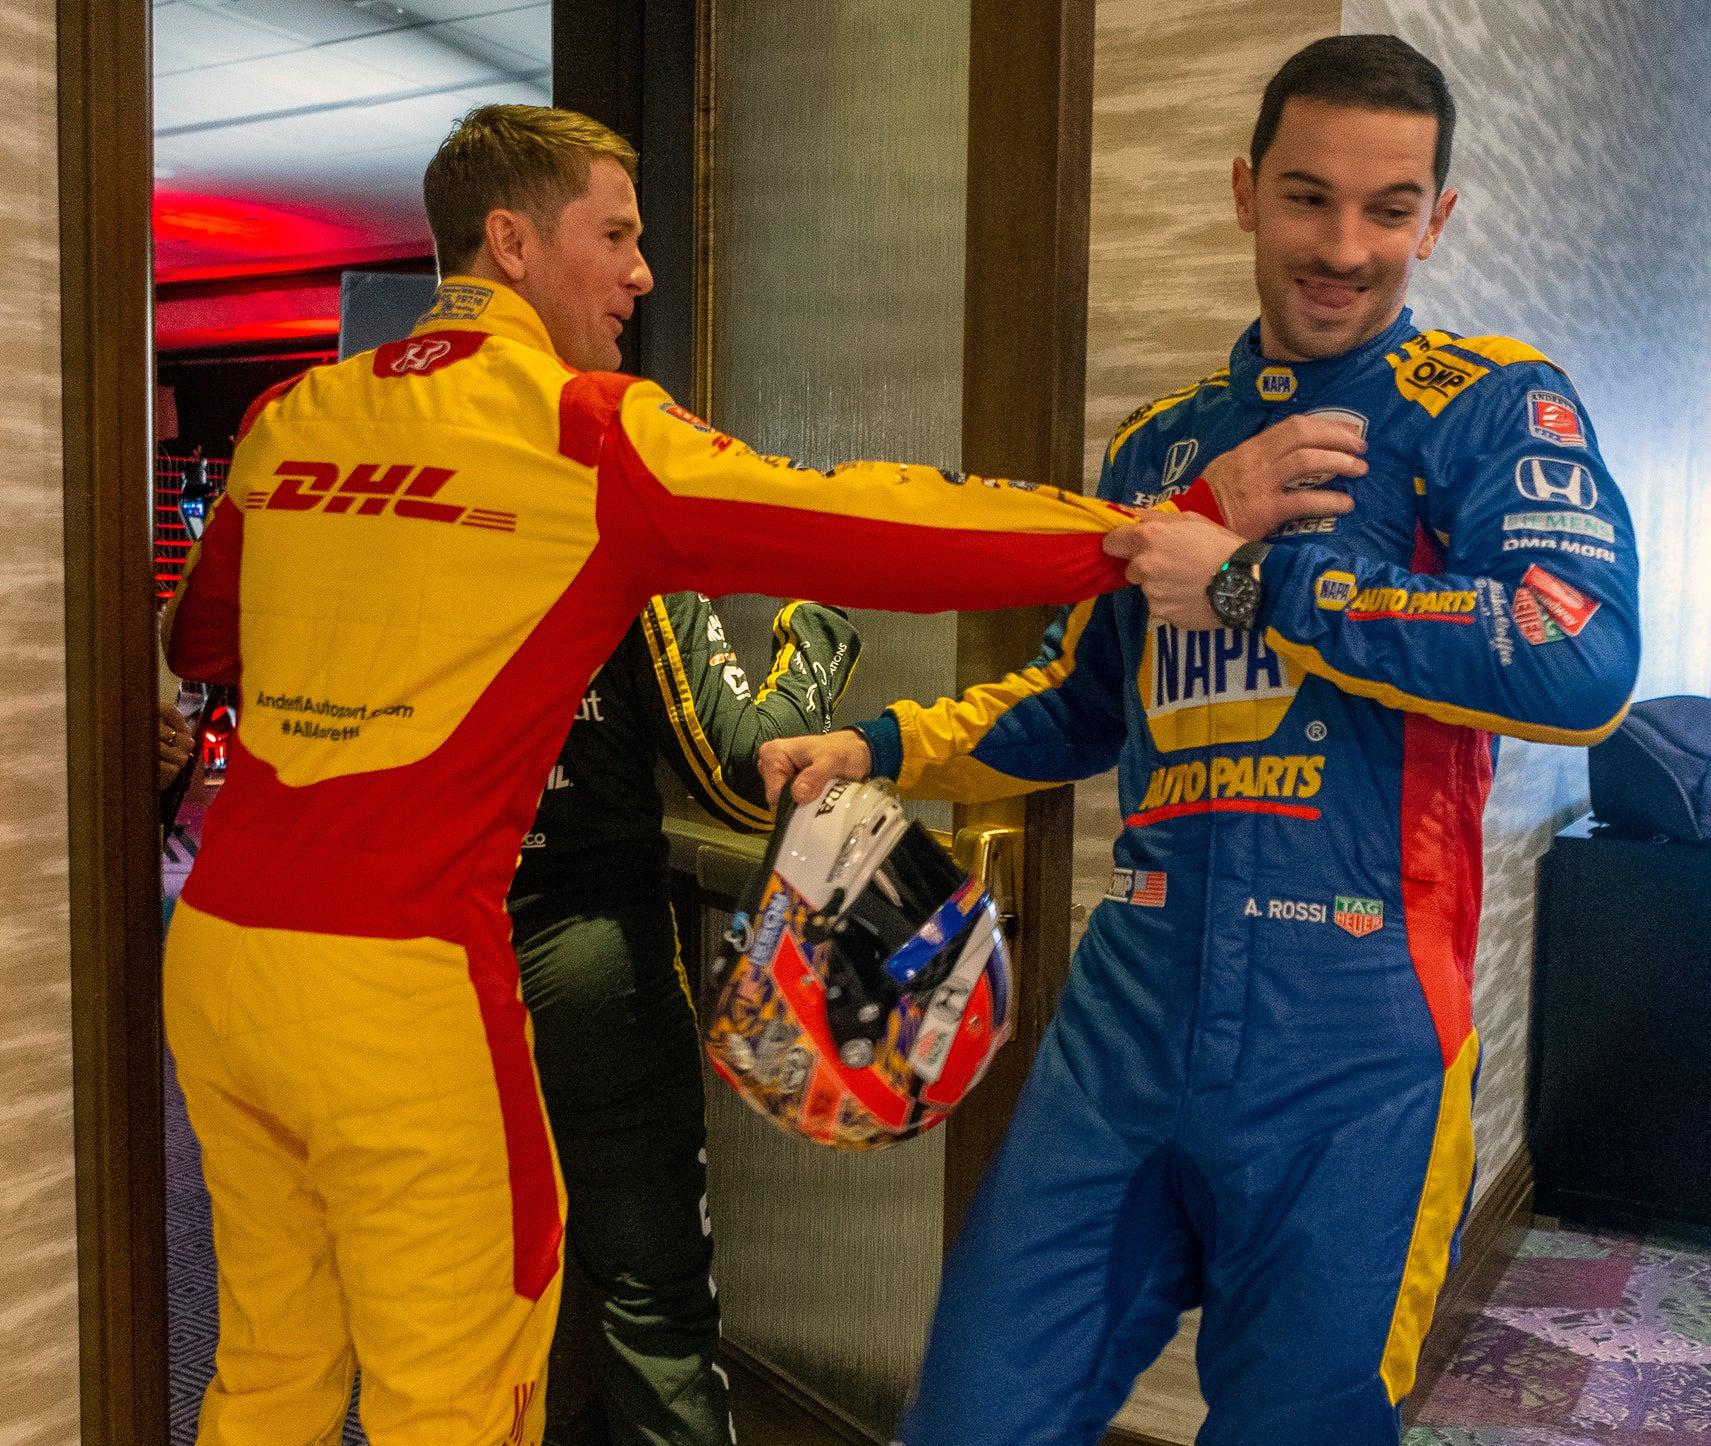 IndyCar Media Day Auto Racing_1549938250174